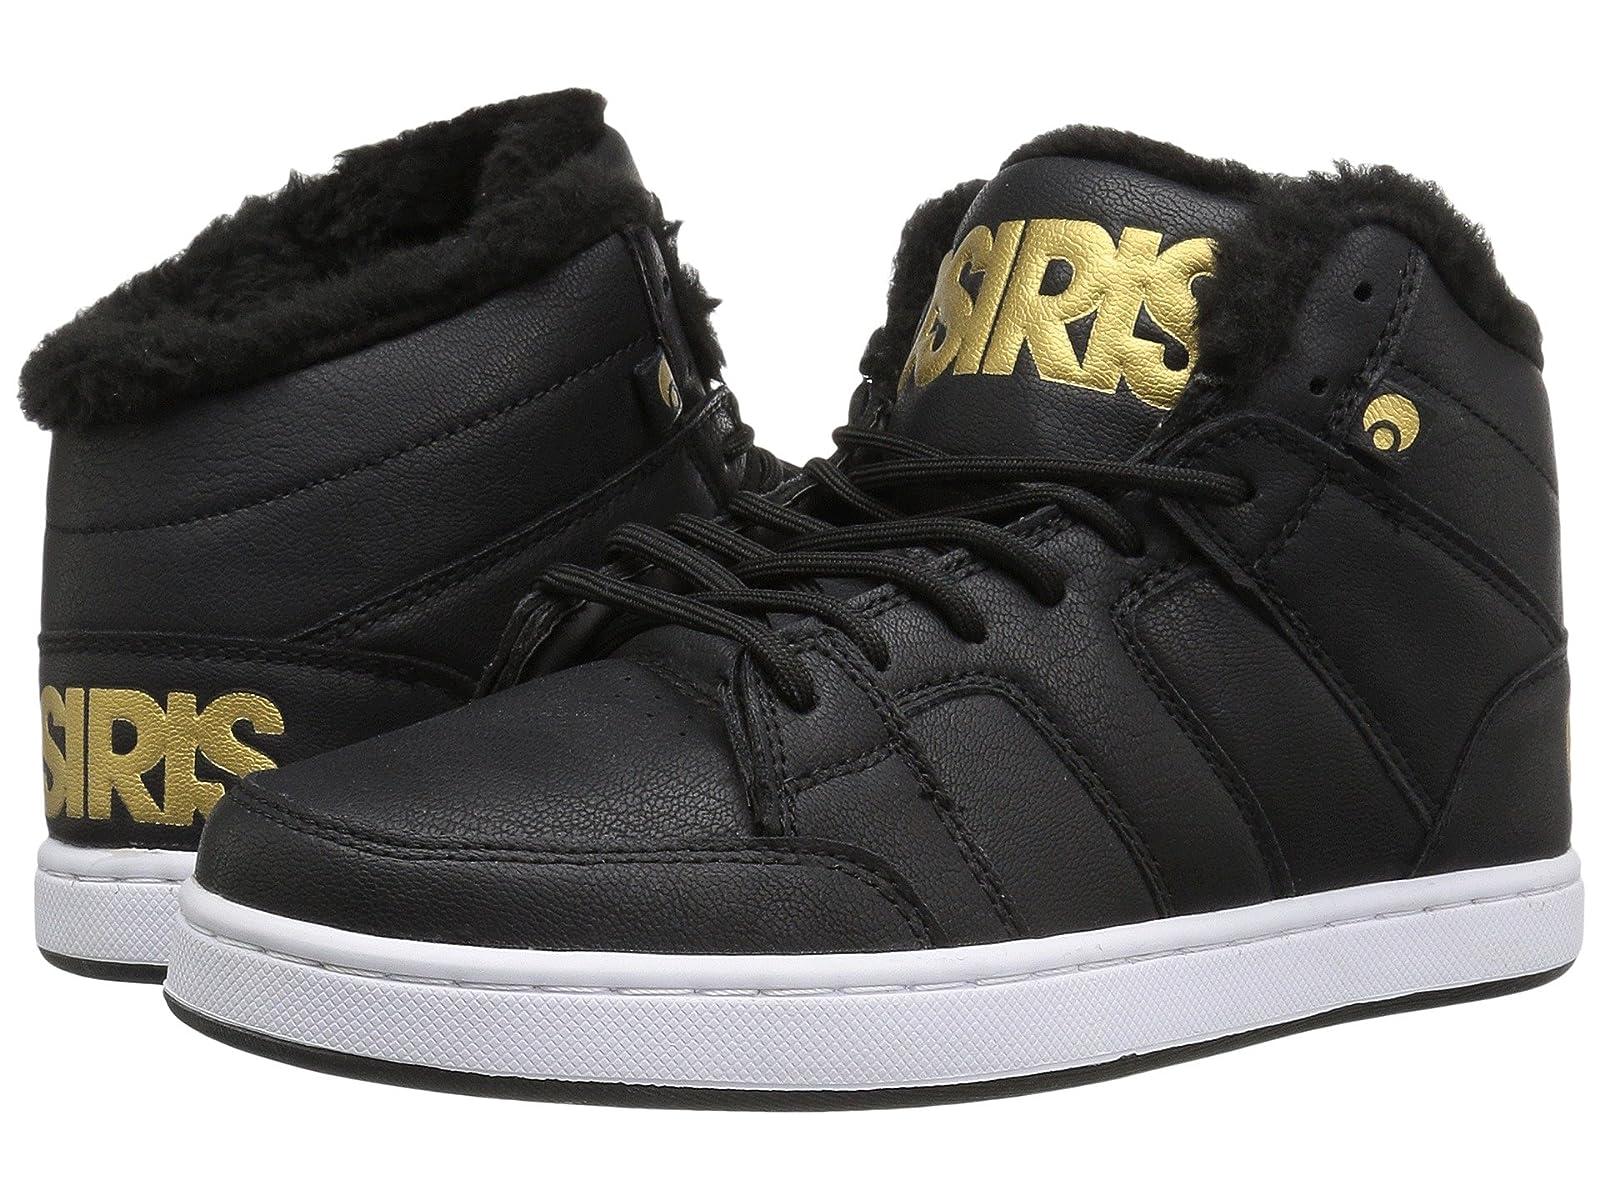 Osiris Convoy Mid SHRCheap and distinctive eye-catching shoes